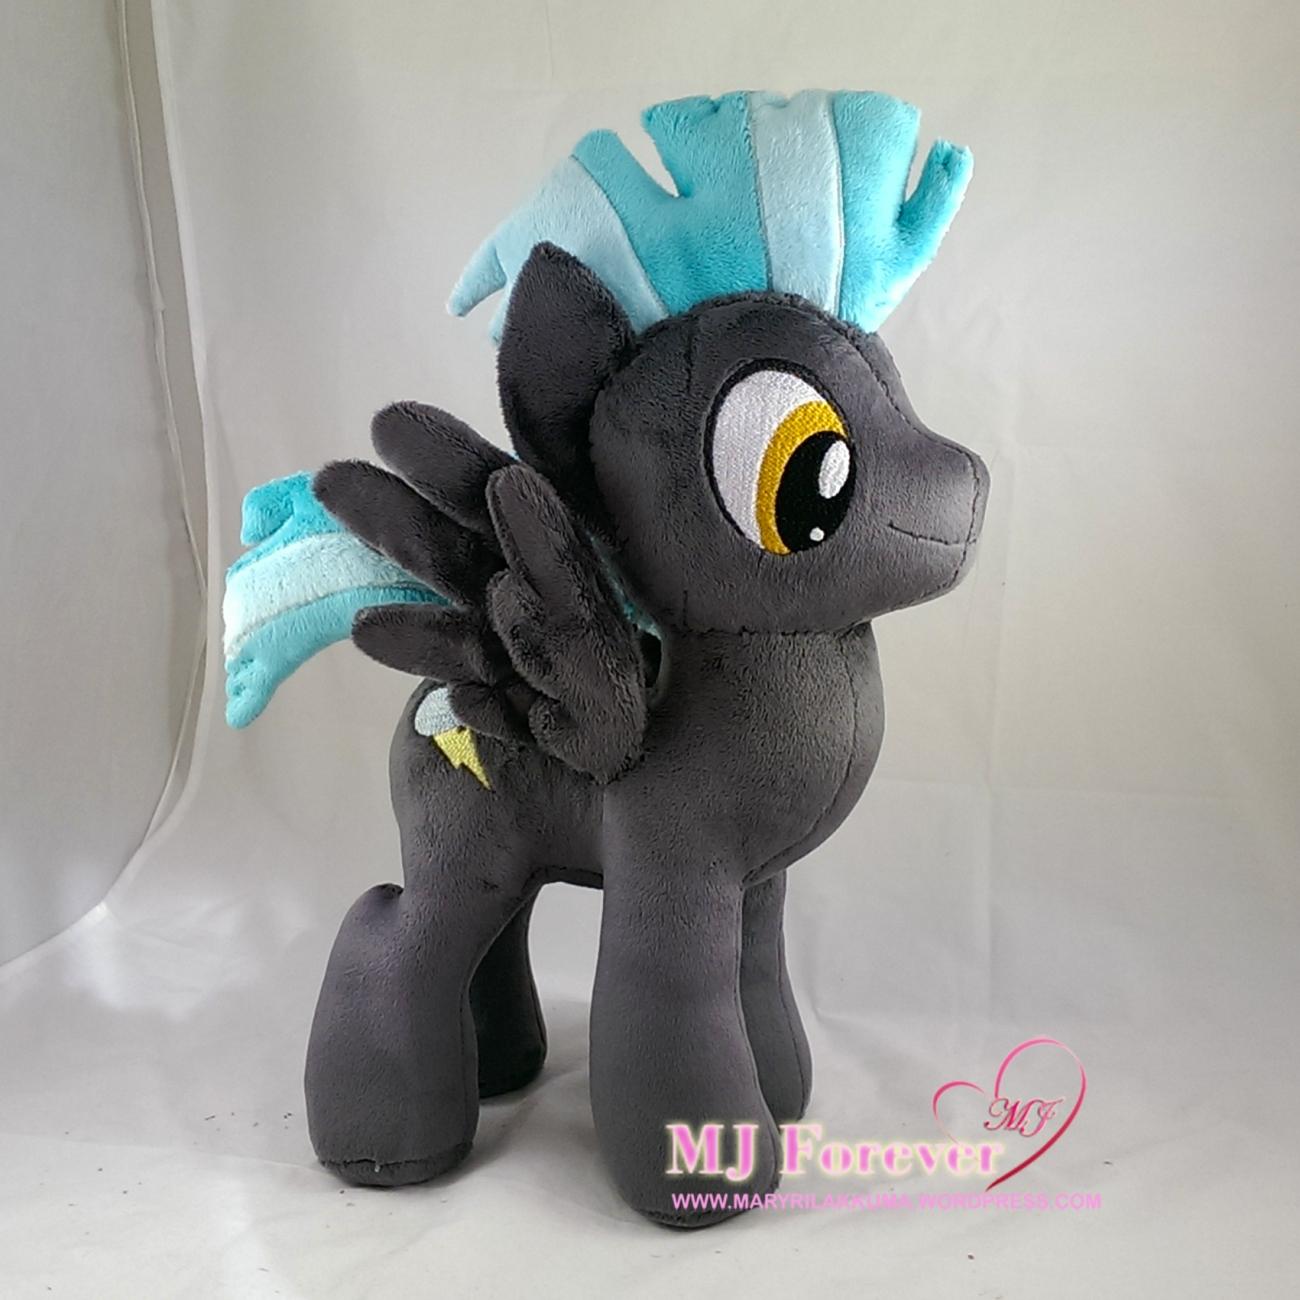 Thunderlane plushie by meeee!!!!